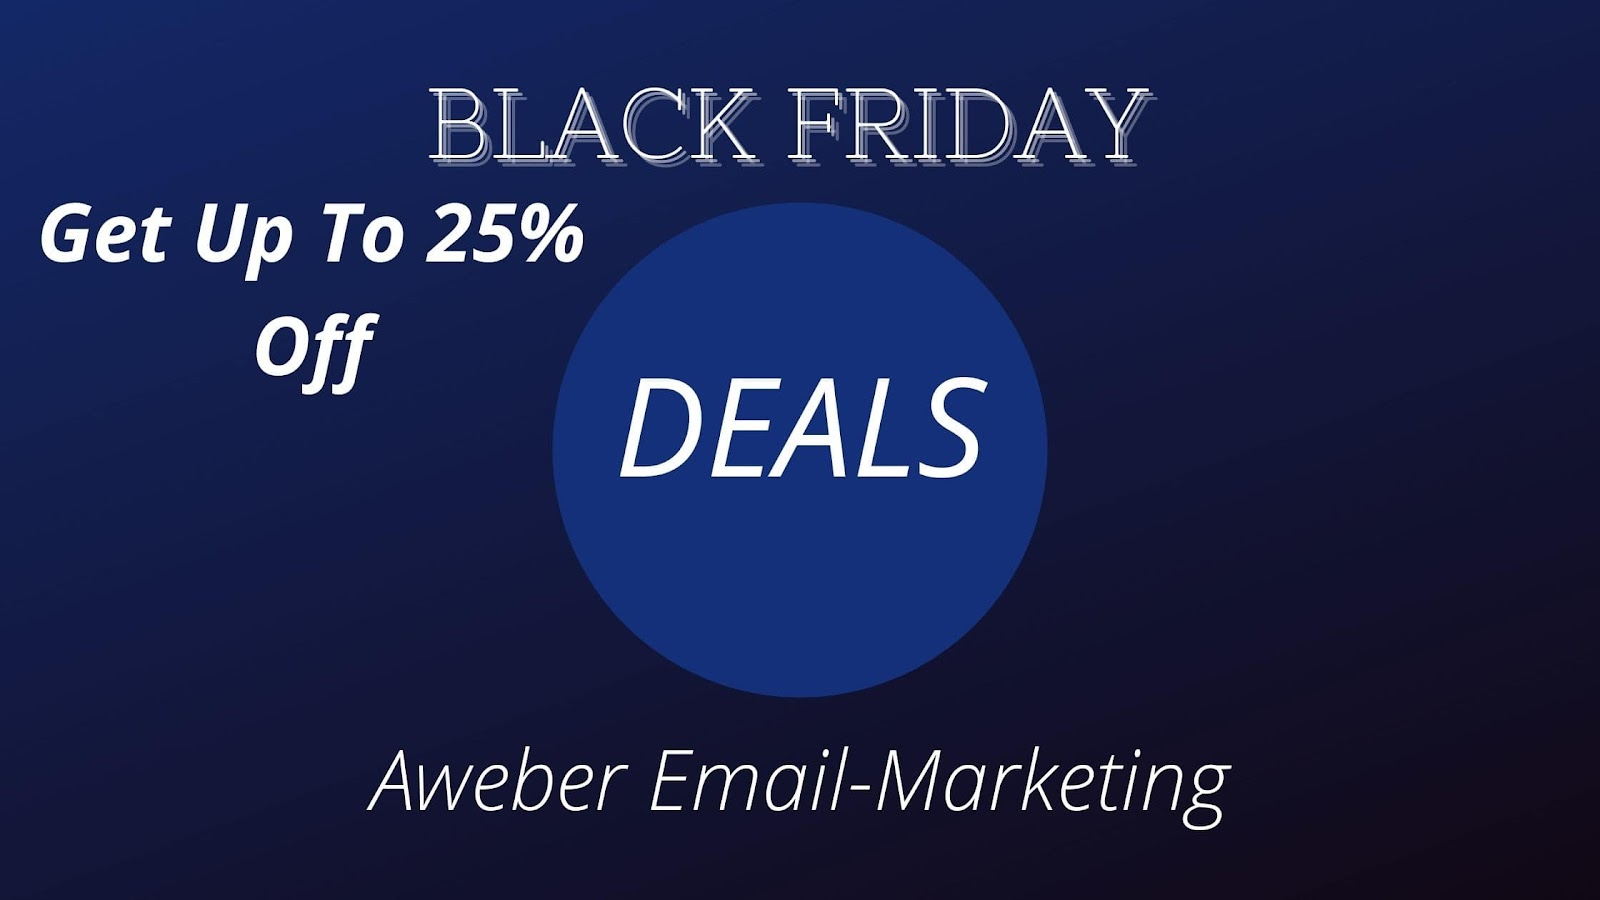 Aweber: Grab 25% off